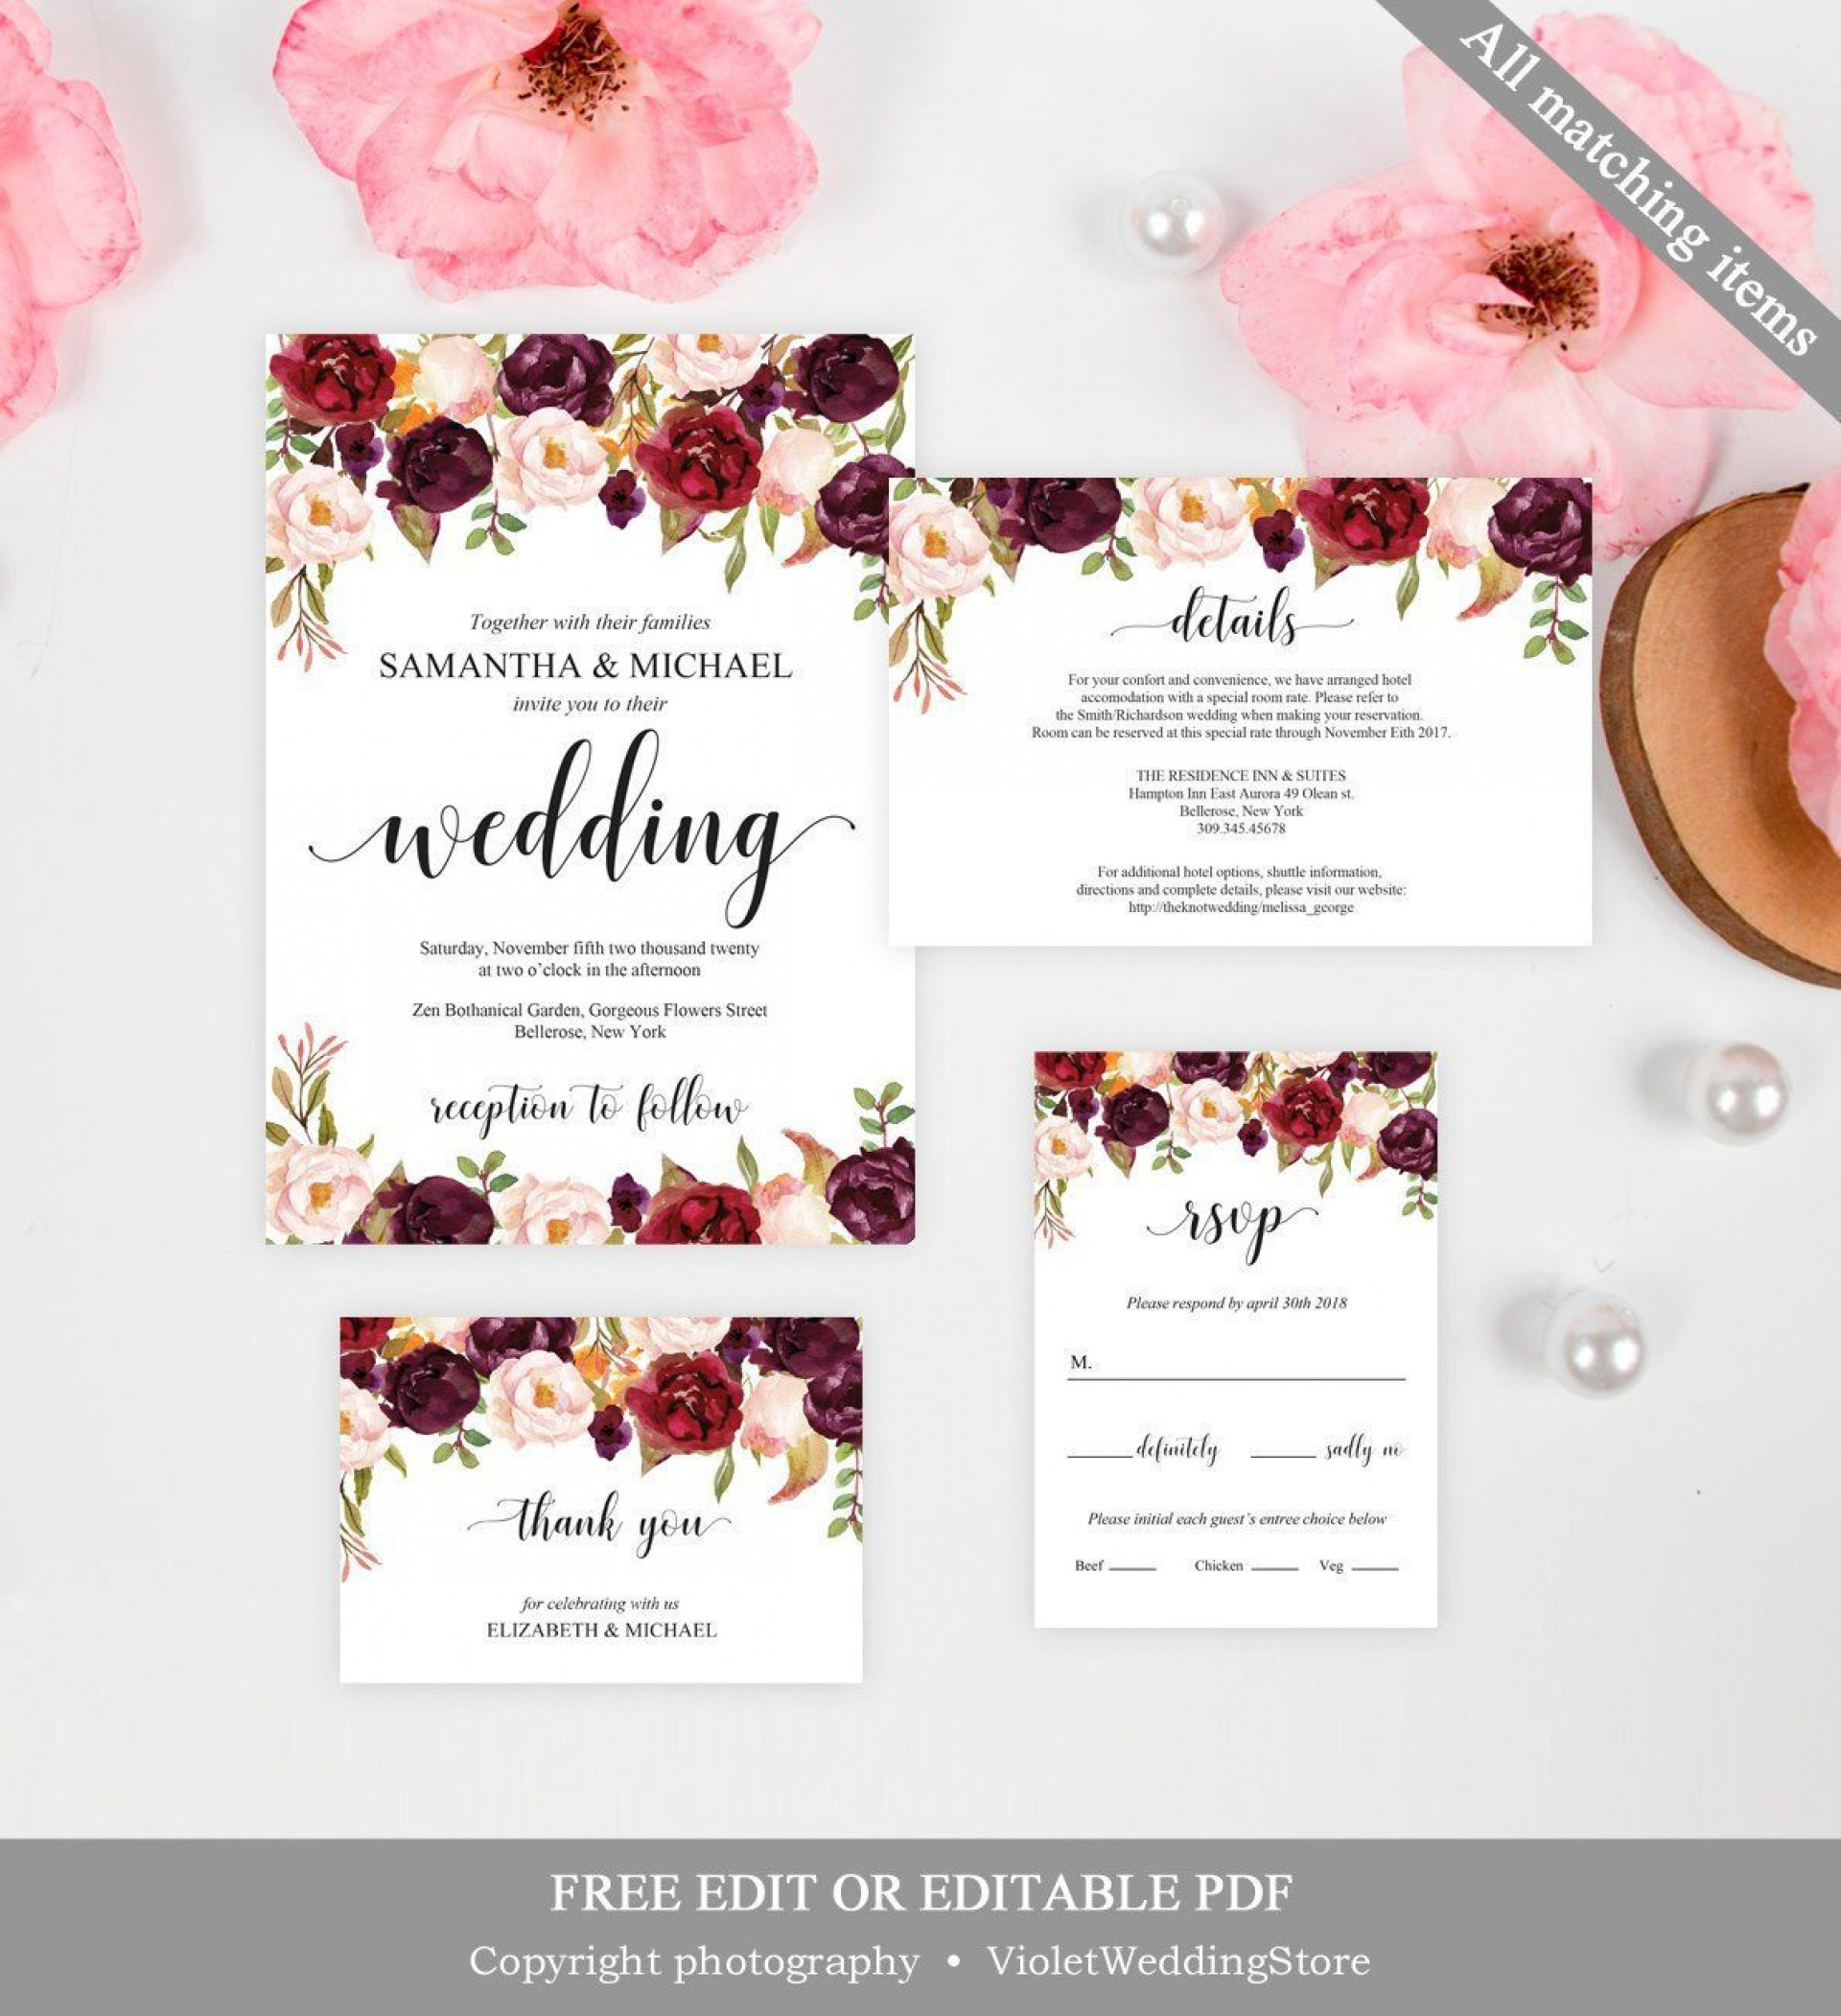 004 Magnificent Formal Wedding Invitation Template Free Inspiration 1920